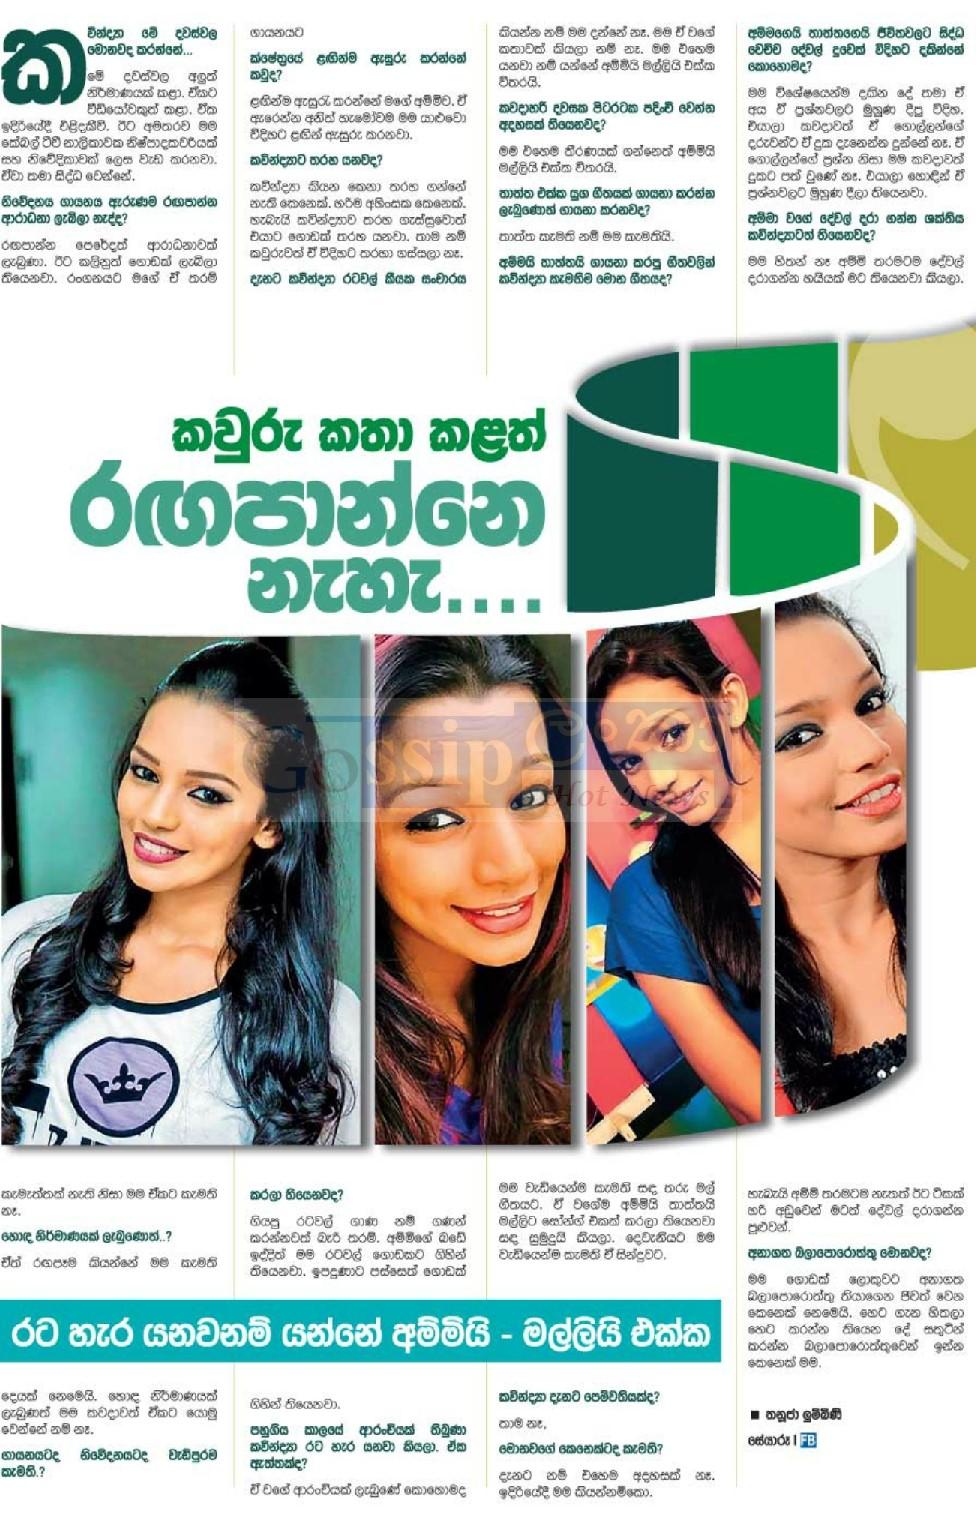 Gossip Chat With Kavindya Adikari | Gossip Lanka News | Hot Gossips